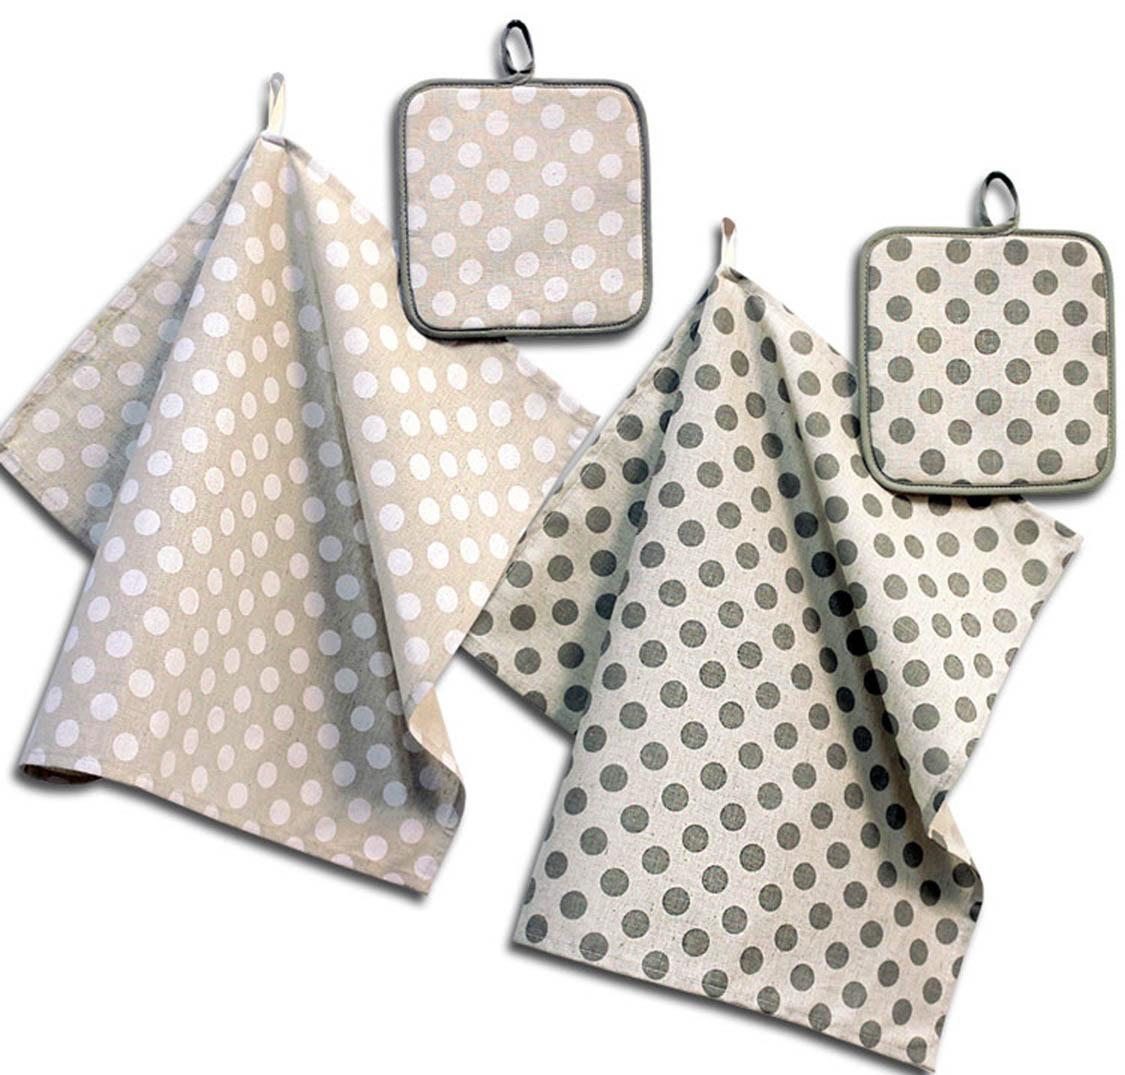 Кухонный набор Гранд-Стиль Гранд-Стиль Кухонное полотенце Горошек Цвет: Серый gst190802